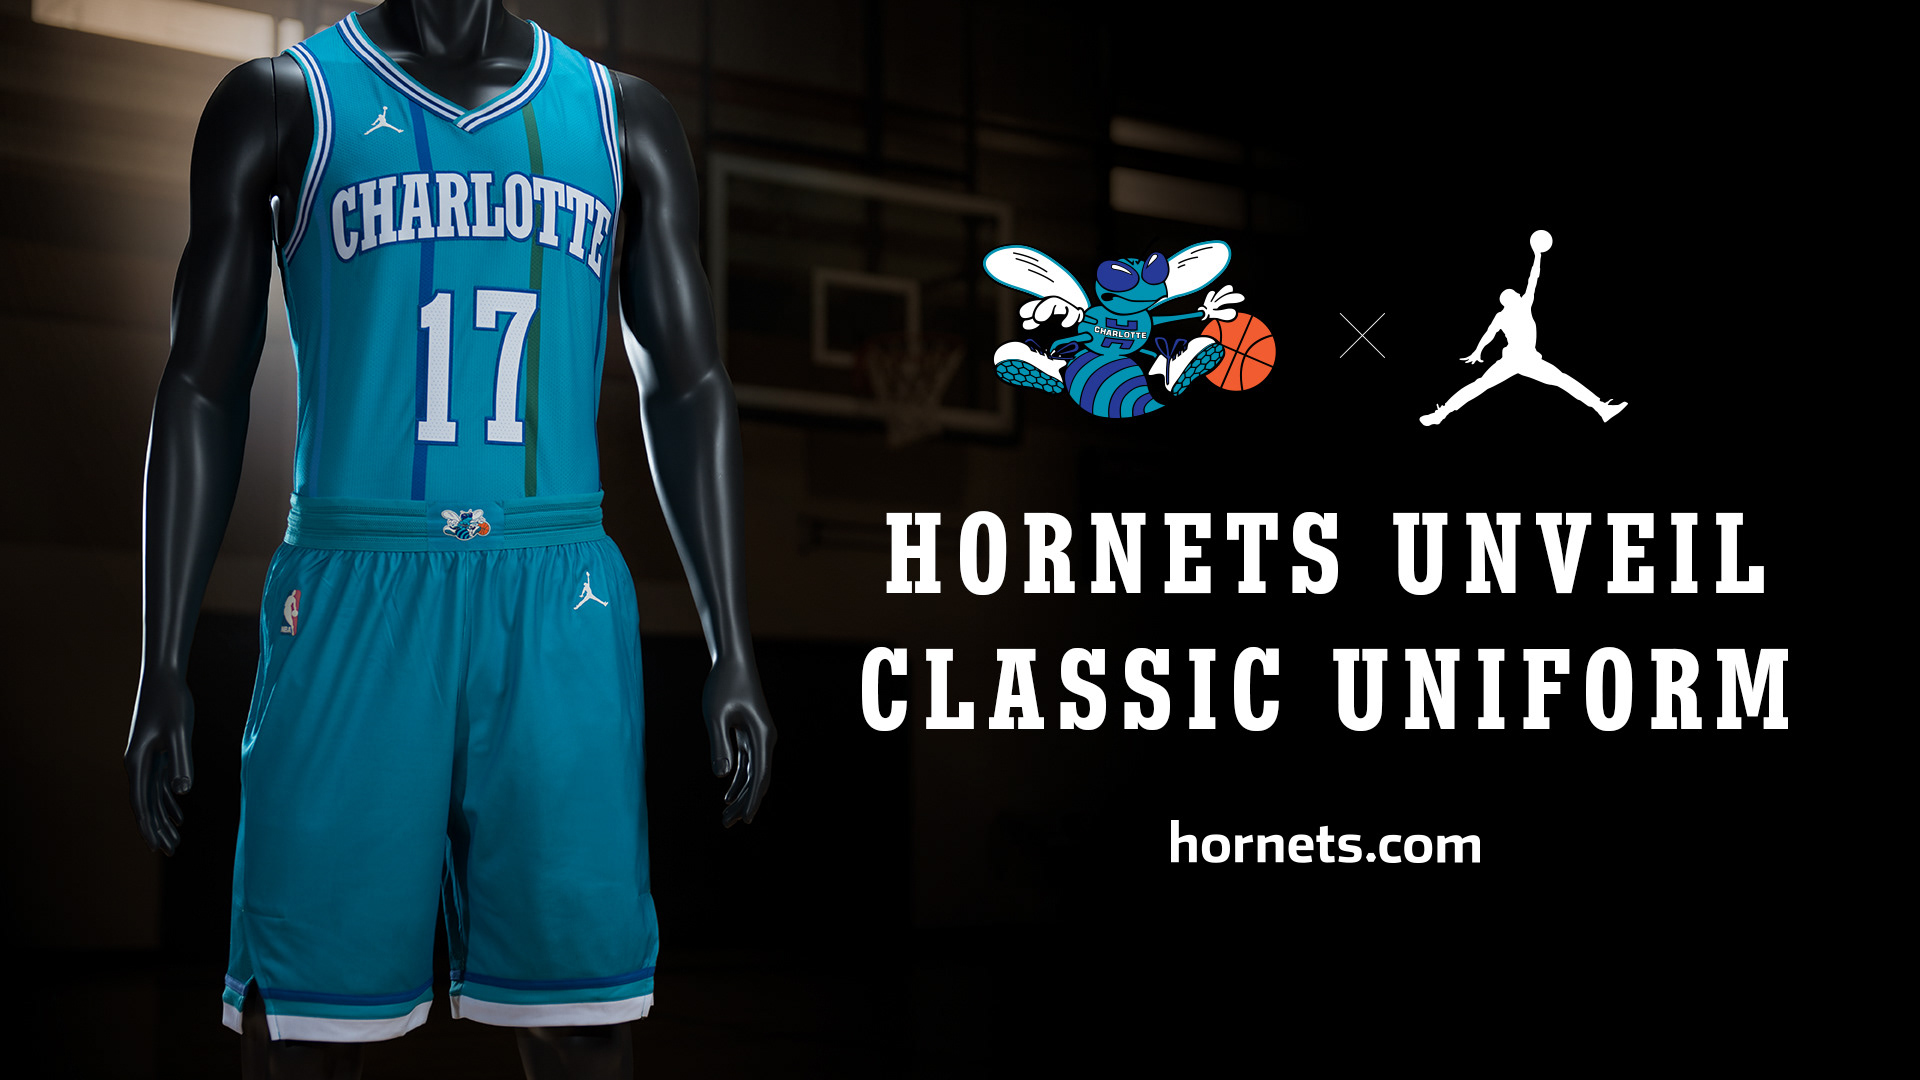 9432c76c3fc Charlotte Hornets - Classic Uniform Launch